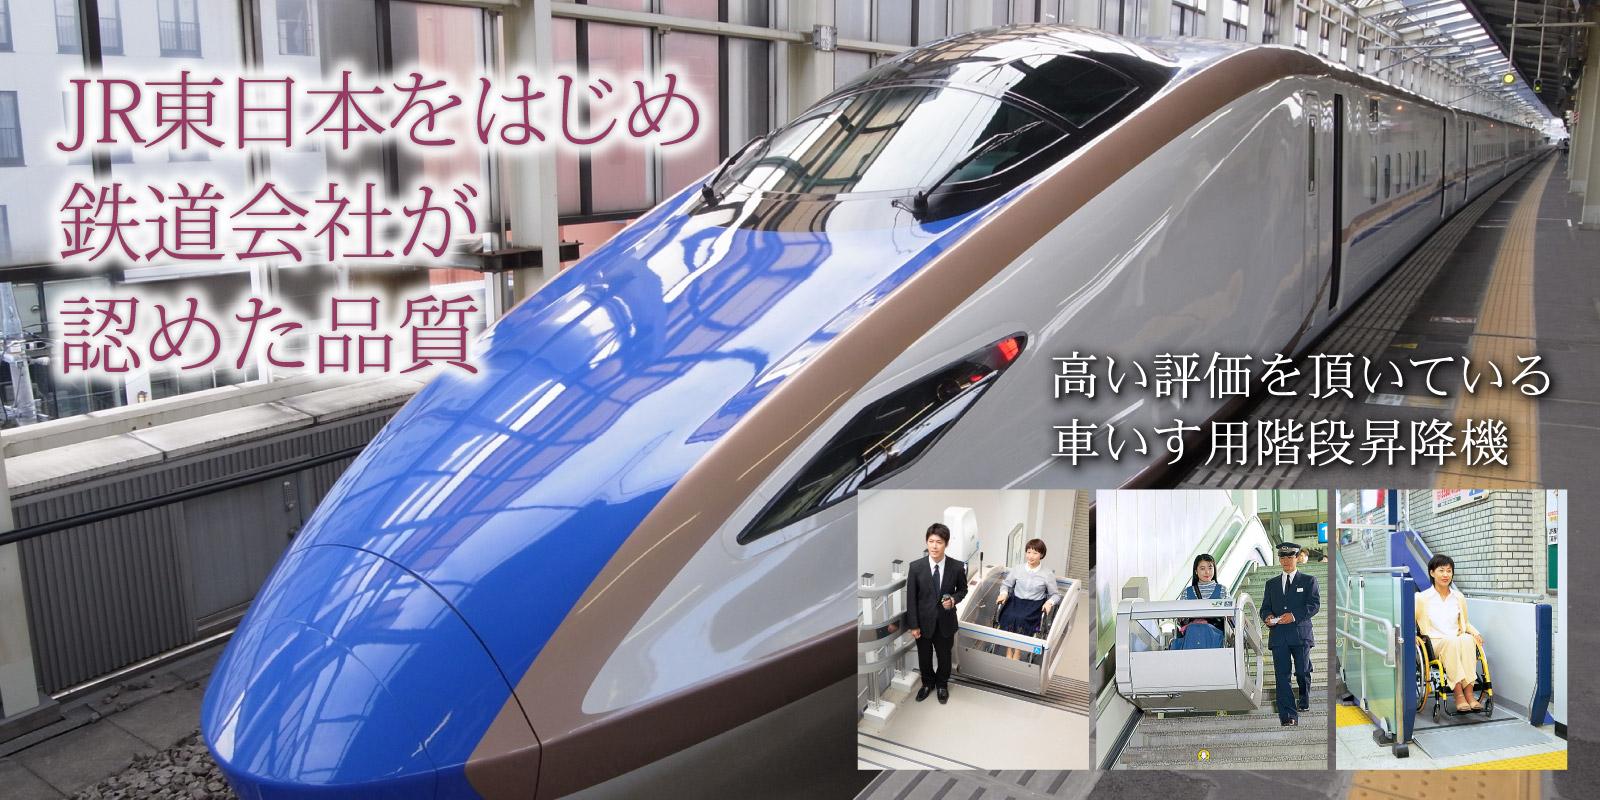 JR東日本をはじめ鉄道会社が認めた品質。車いす用階段昇降機